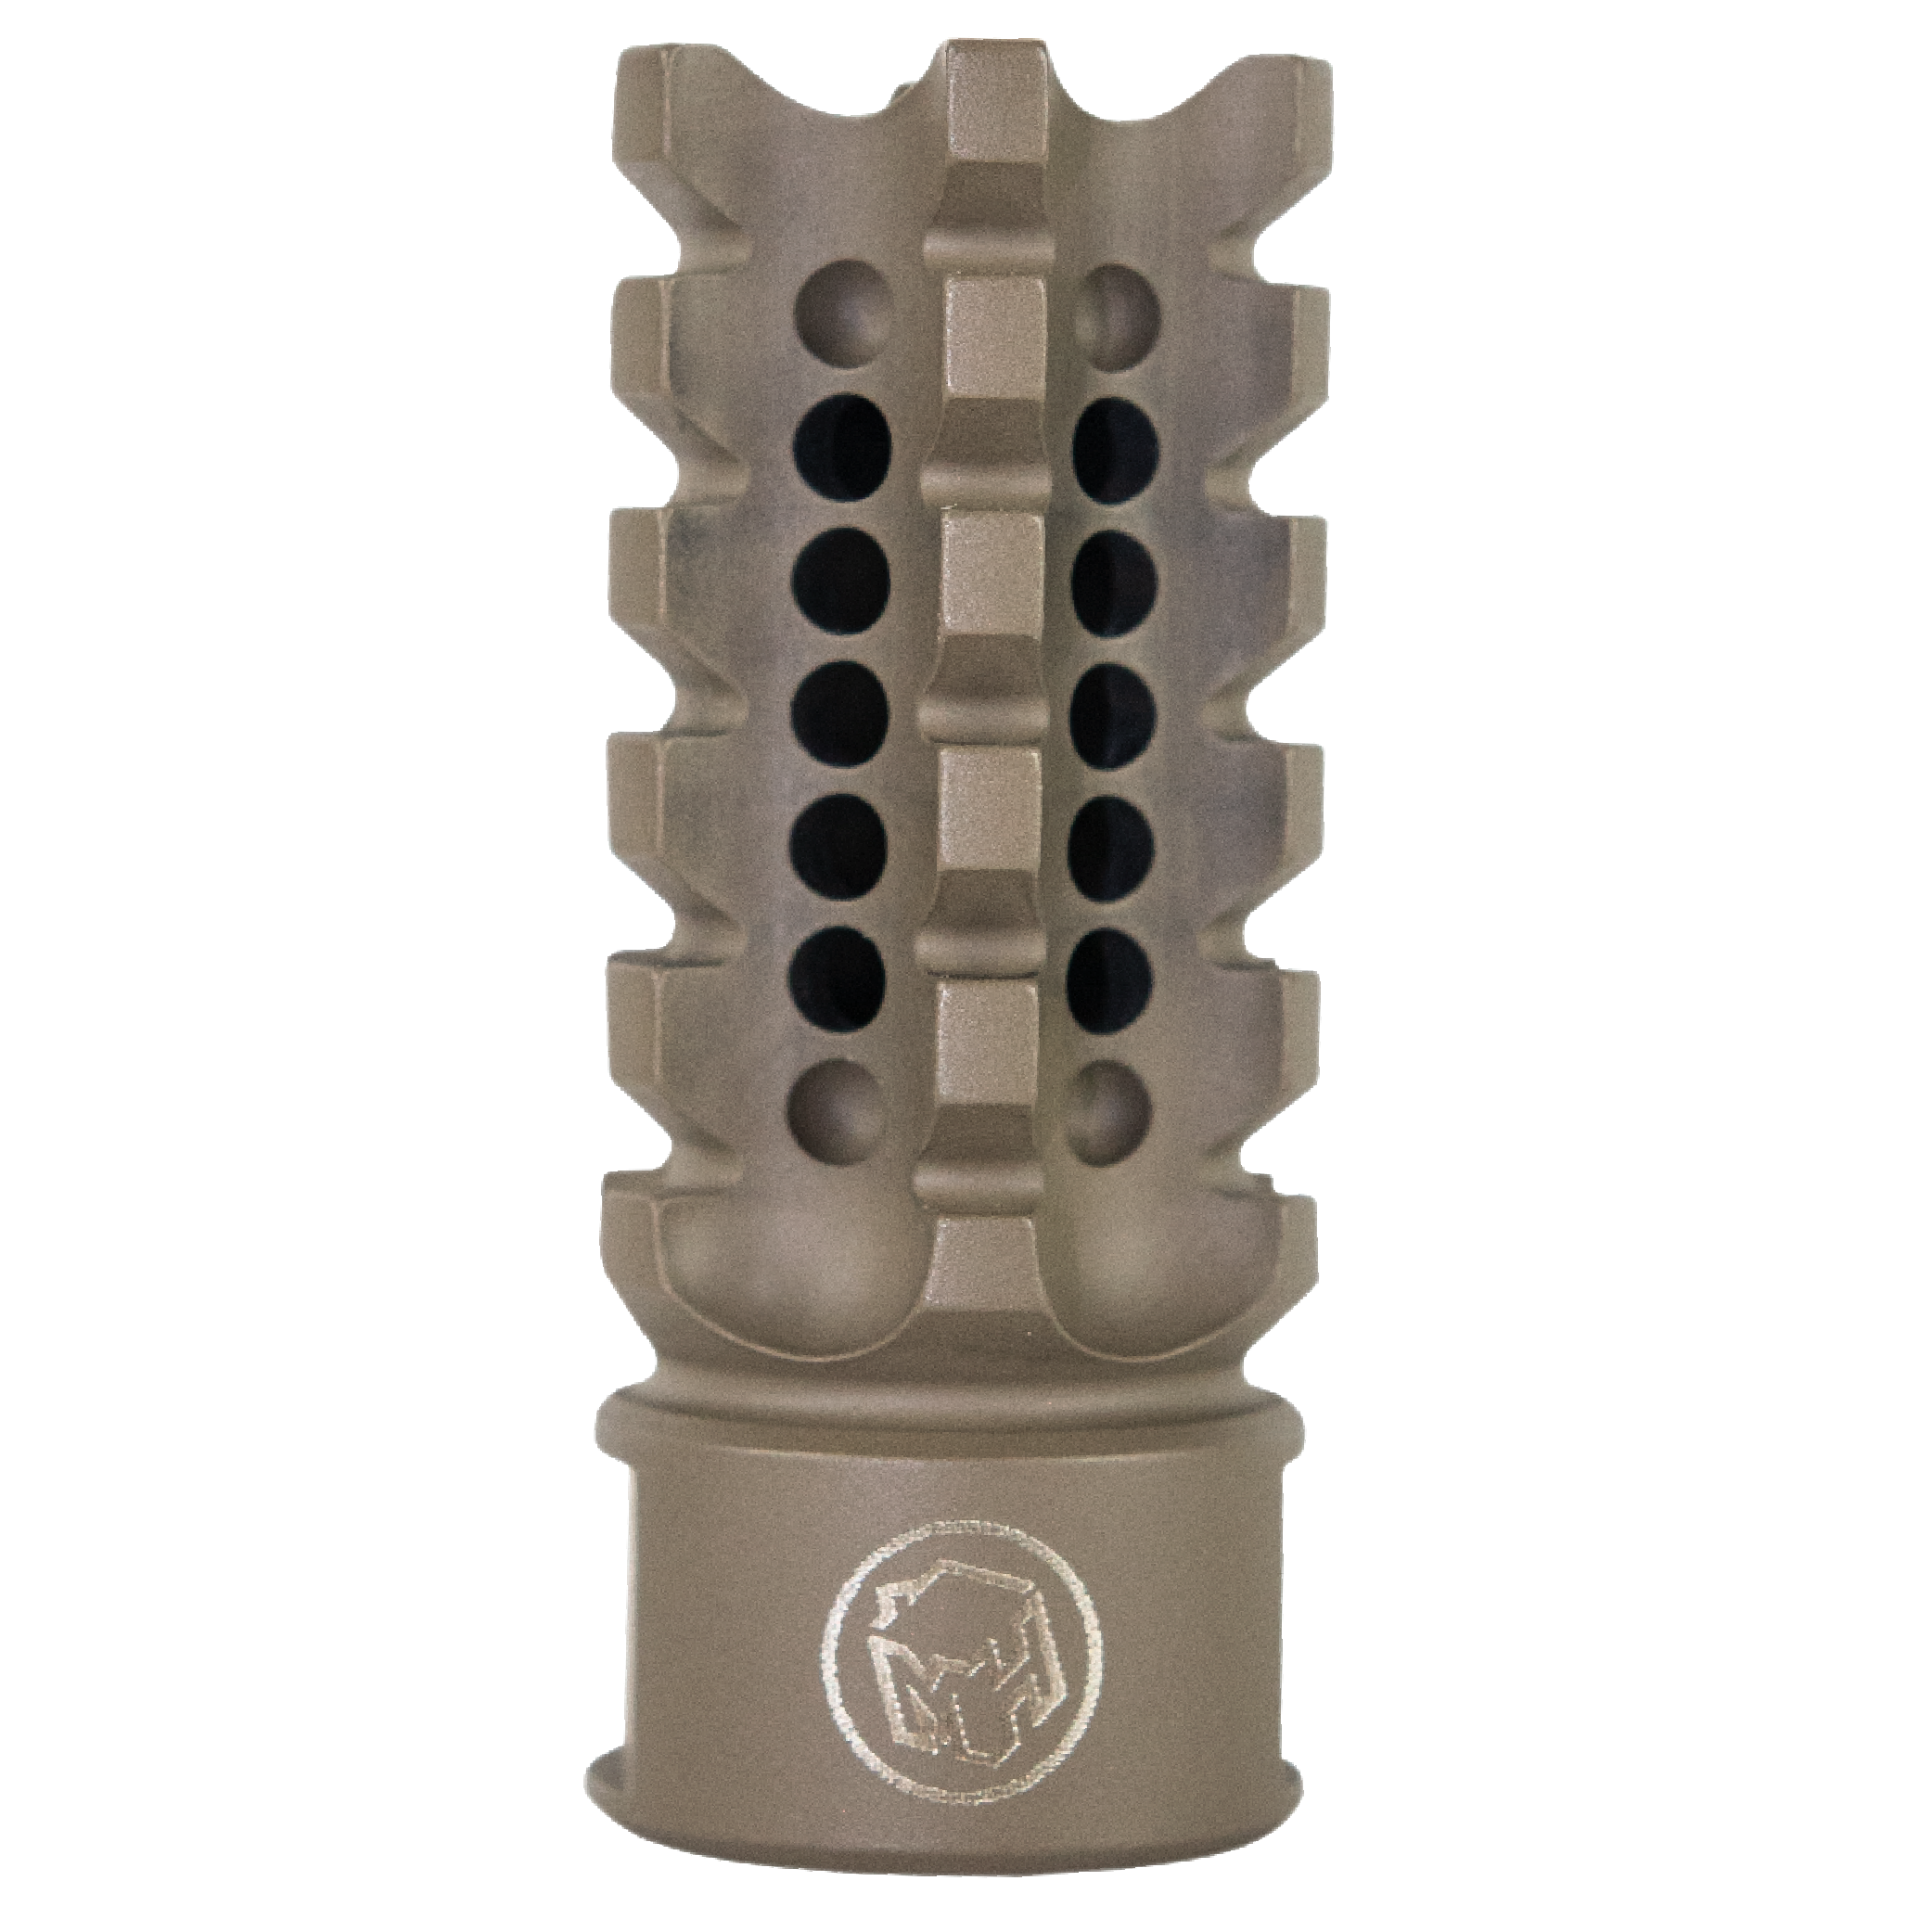 Madhouse Design XHC Flat Earth Serrated 308W Muzzle Brake